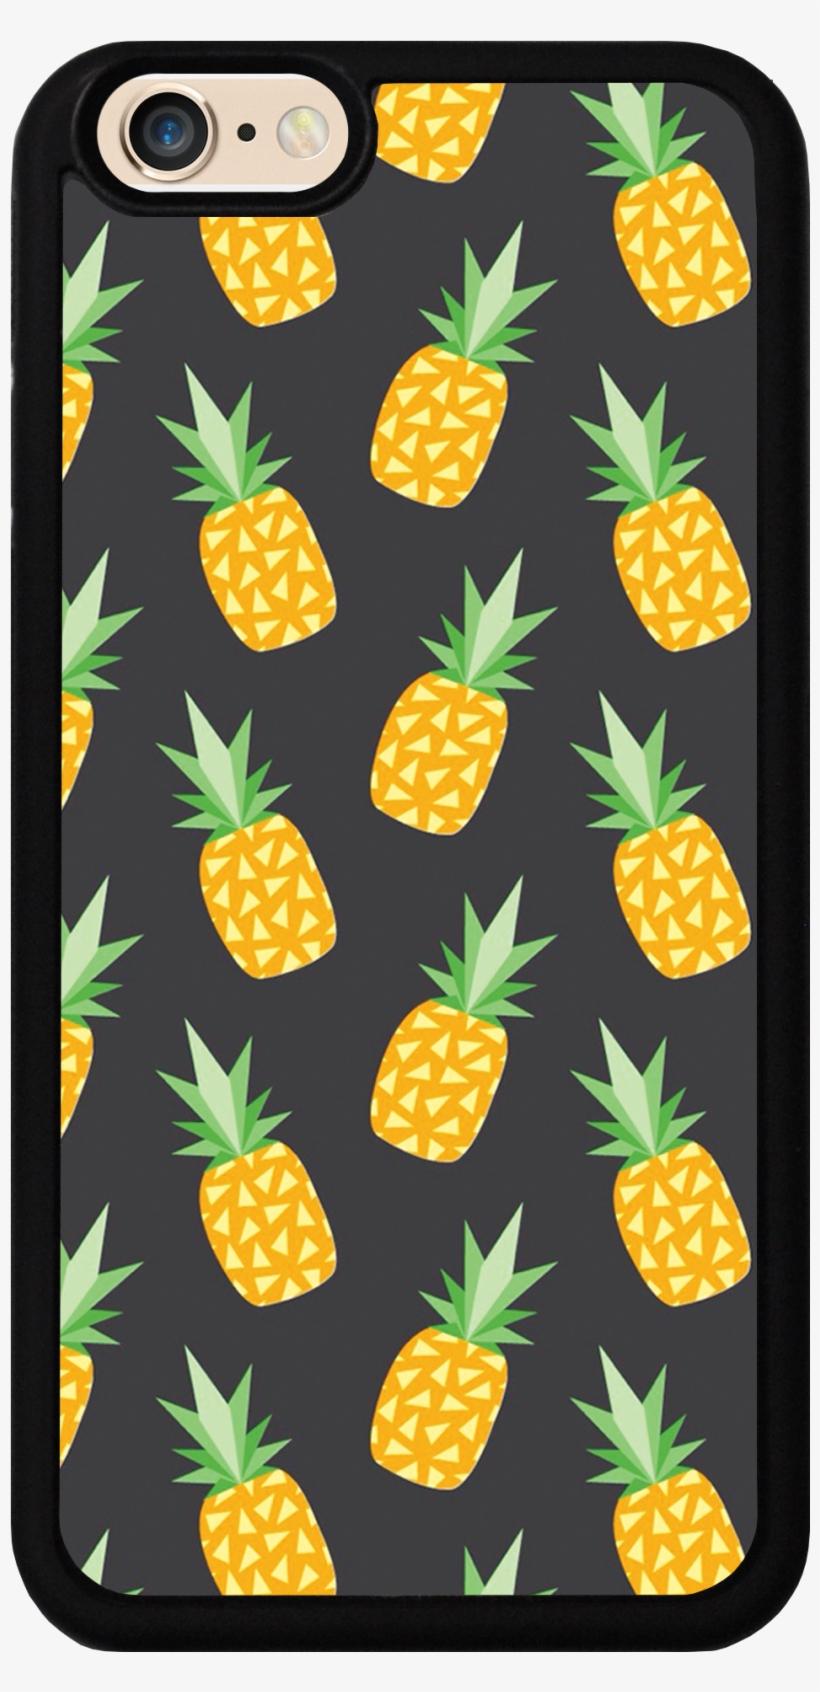 Pineapple Case - Fruits Wallpaper Lock Screen Hd, transparent png #9174602